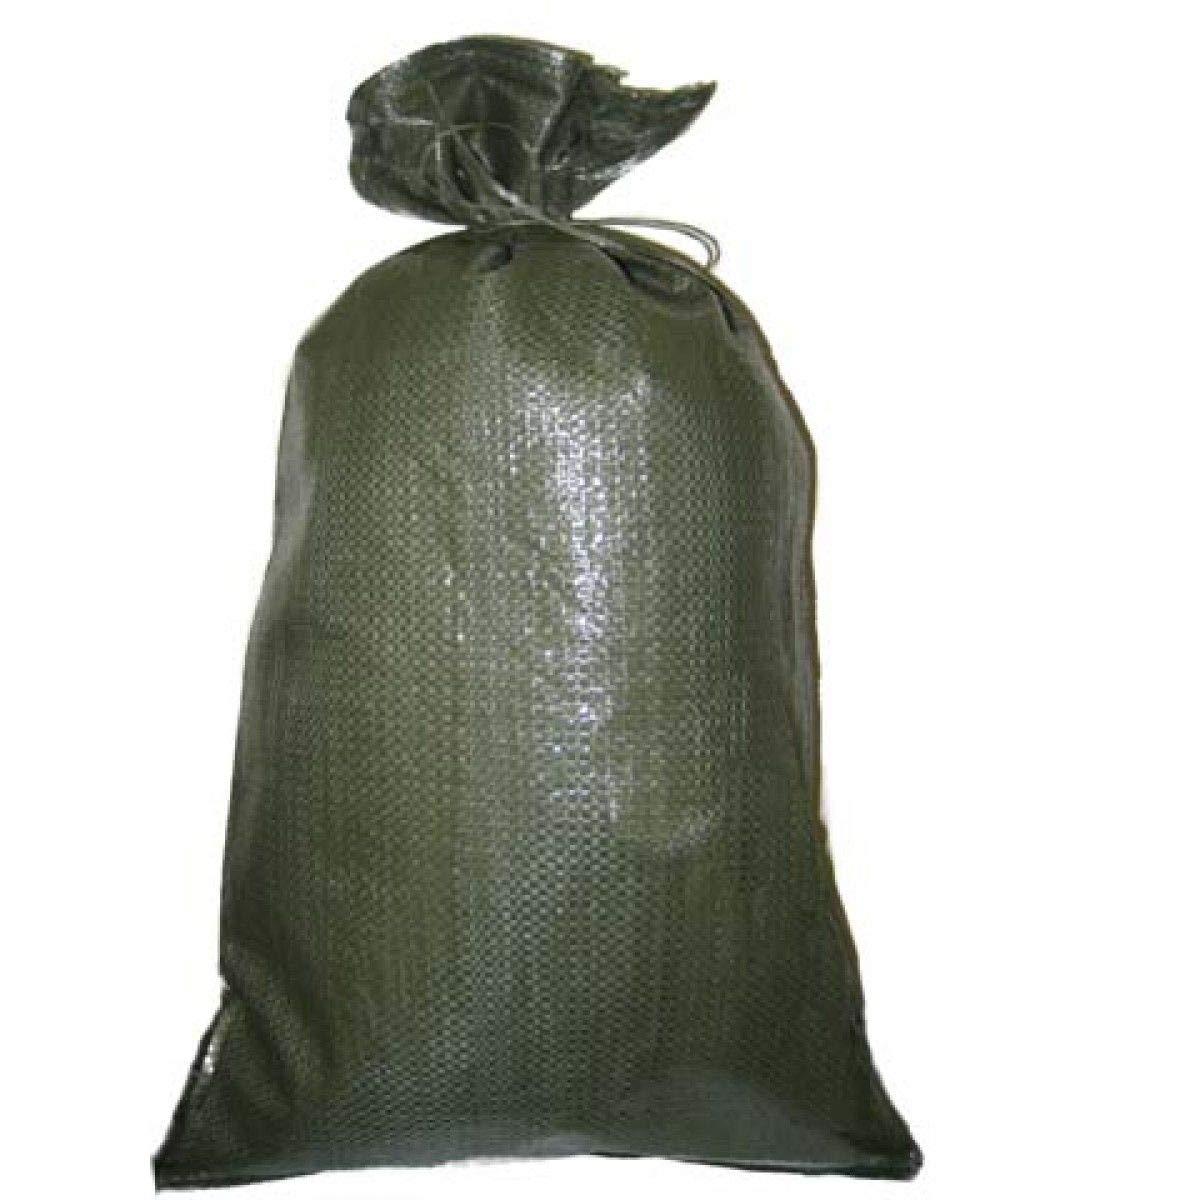 75 YUZET GREEN SANDBAG POLYPROPYLENE WOVEN UV PROOF ROT PROOF - EMPTY Bestport (Europe) Ltd